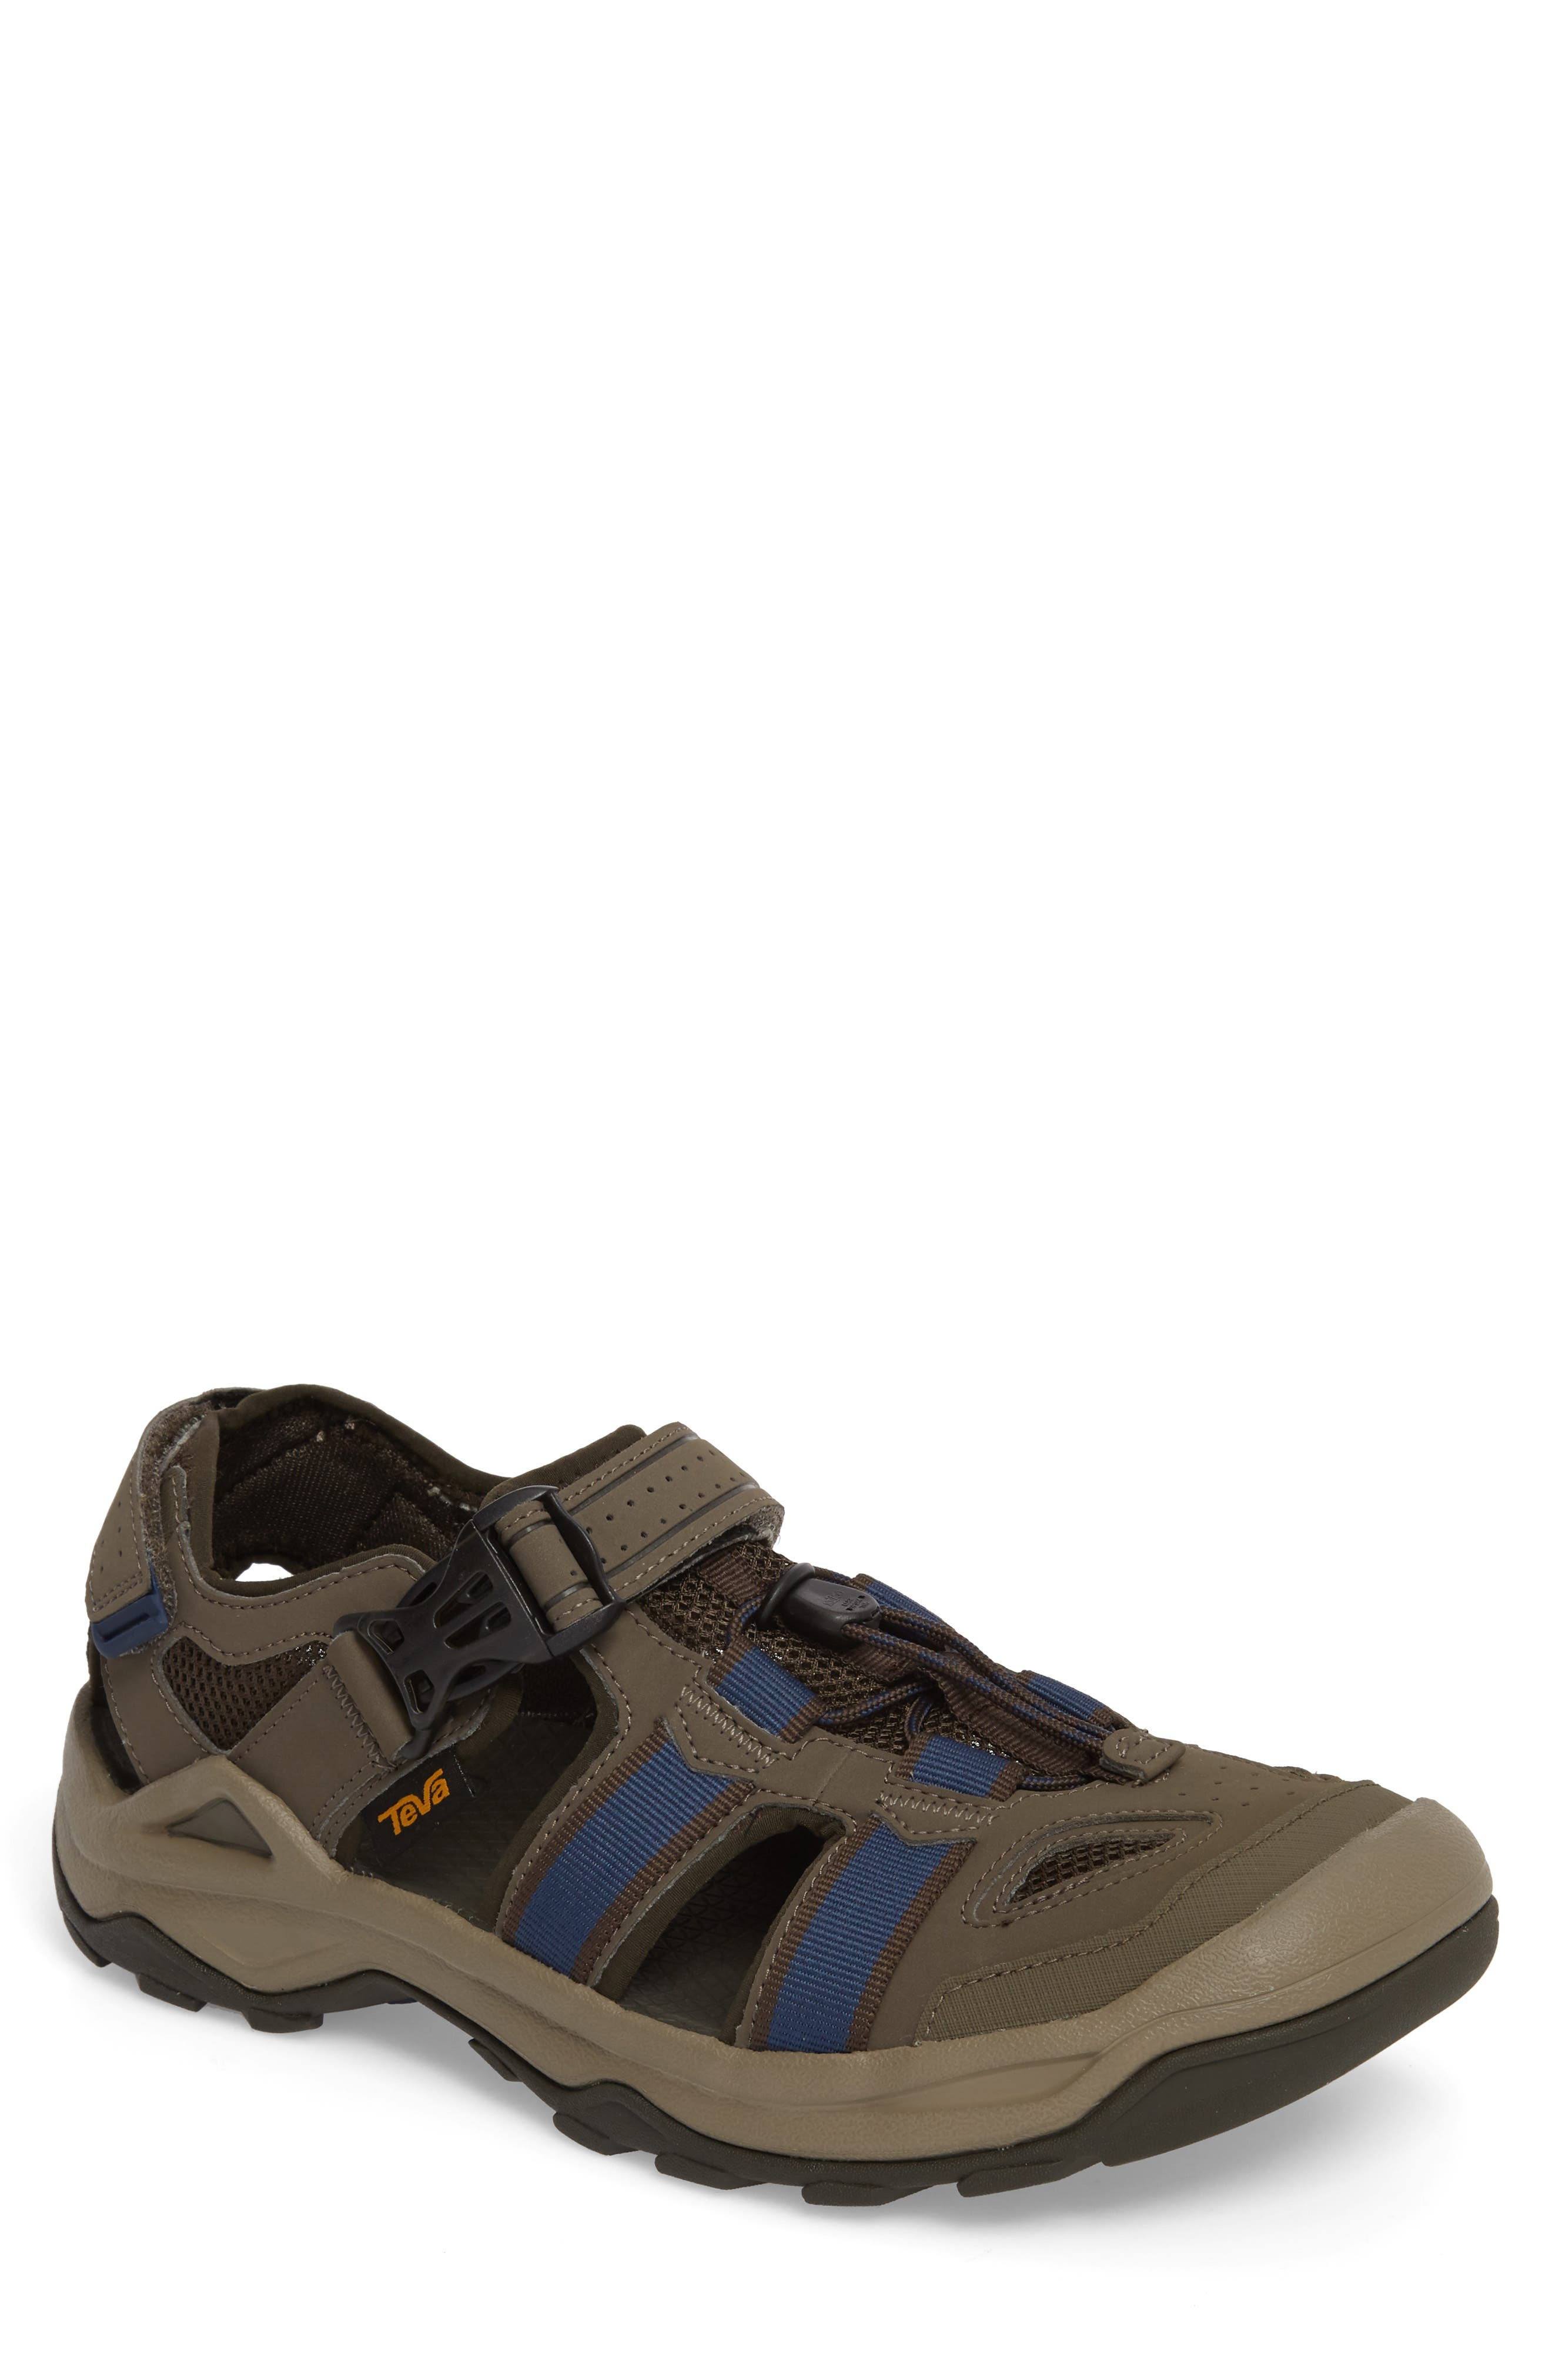 Omnium 2 Hiking Sandal,                         Main,                         color, BROWN NYLON